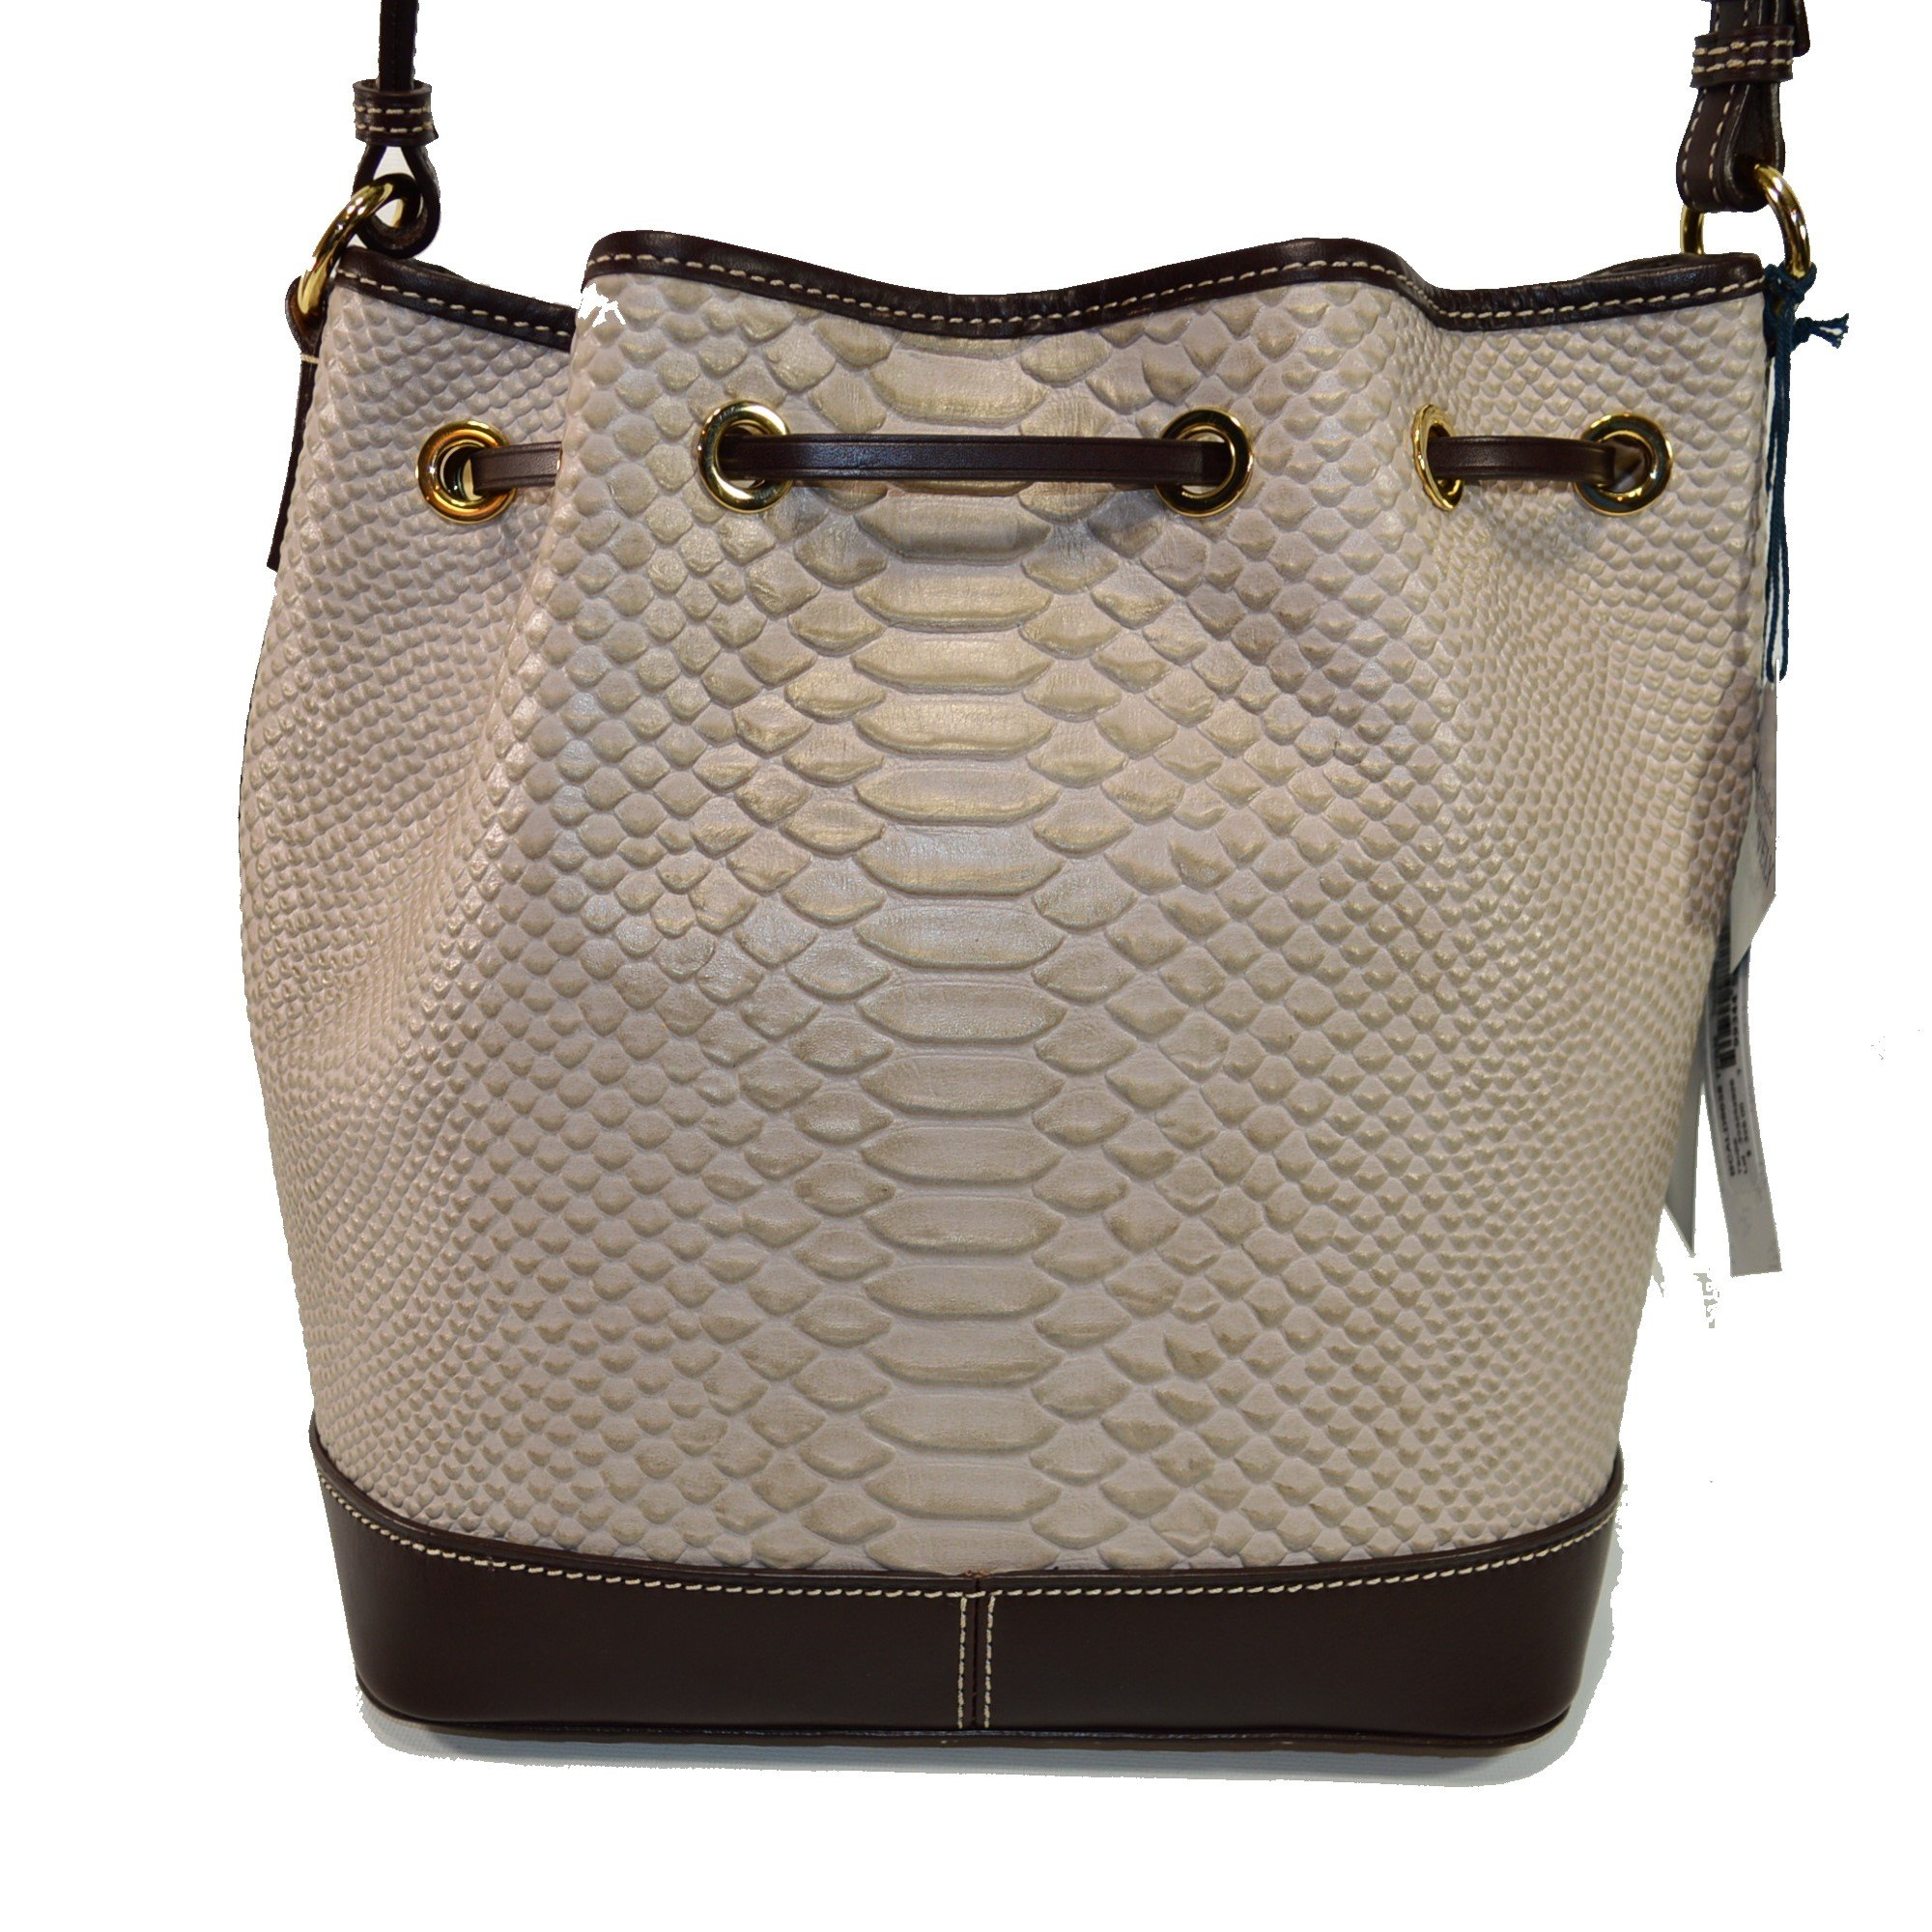 Dooney & Bourke Cordova Leather Drawstring Bag BCALD9038 Taupe by Dooney & Bourke (Image #3)